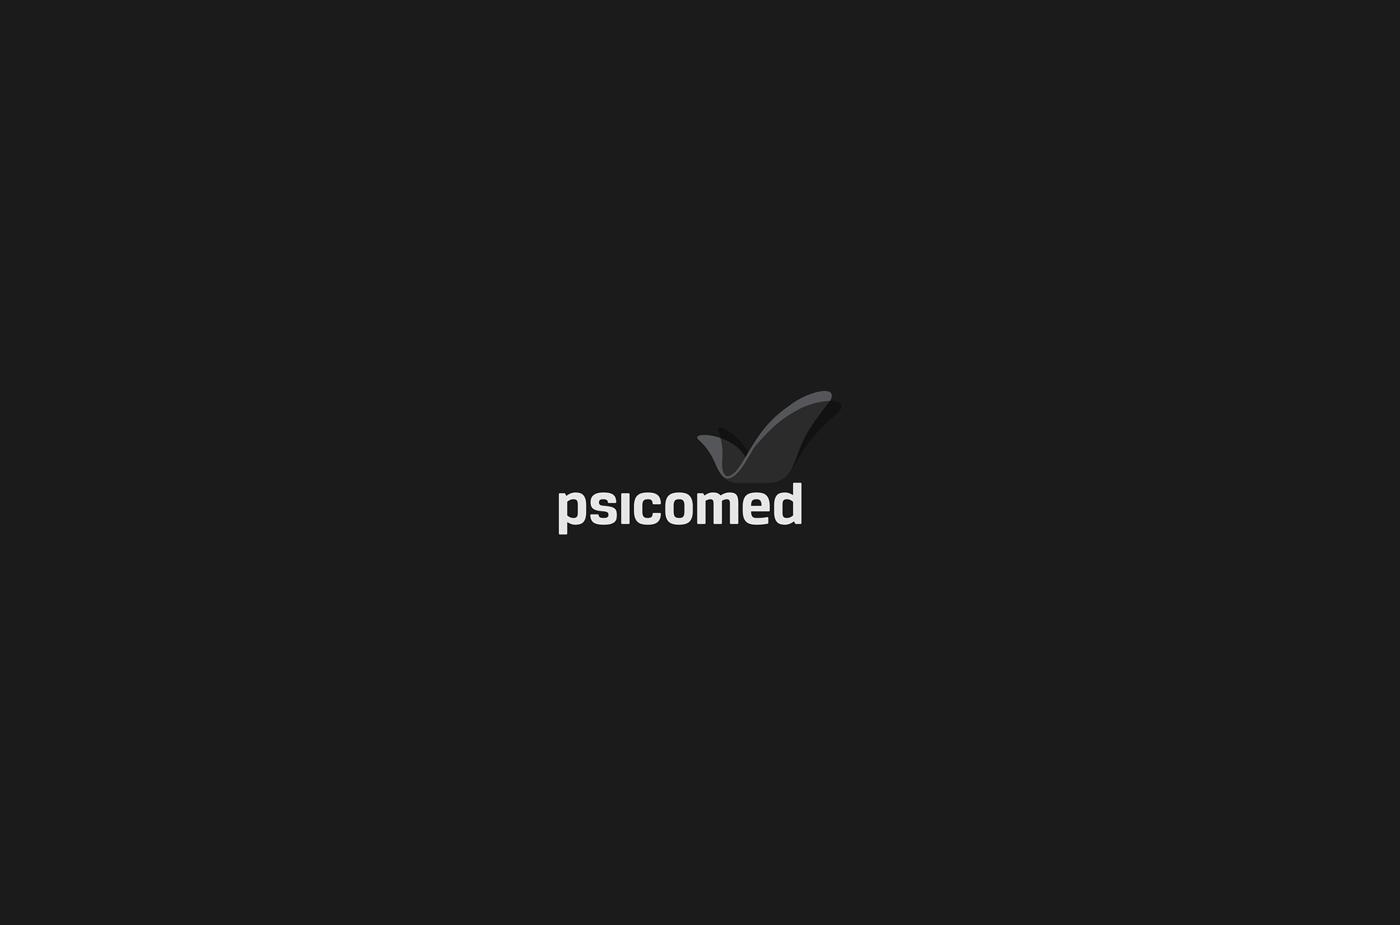 Psicomed.png